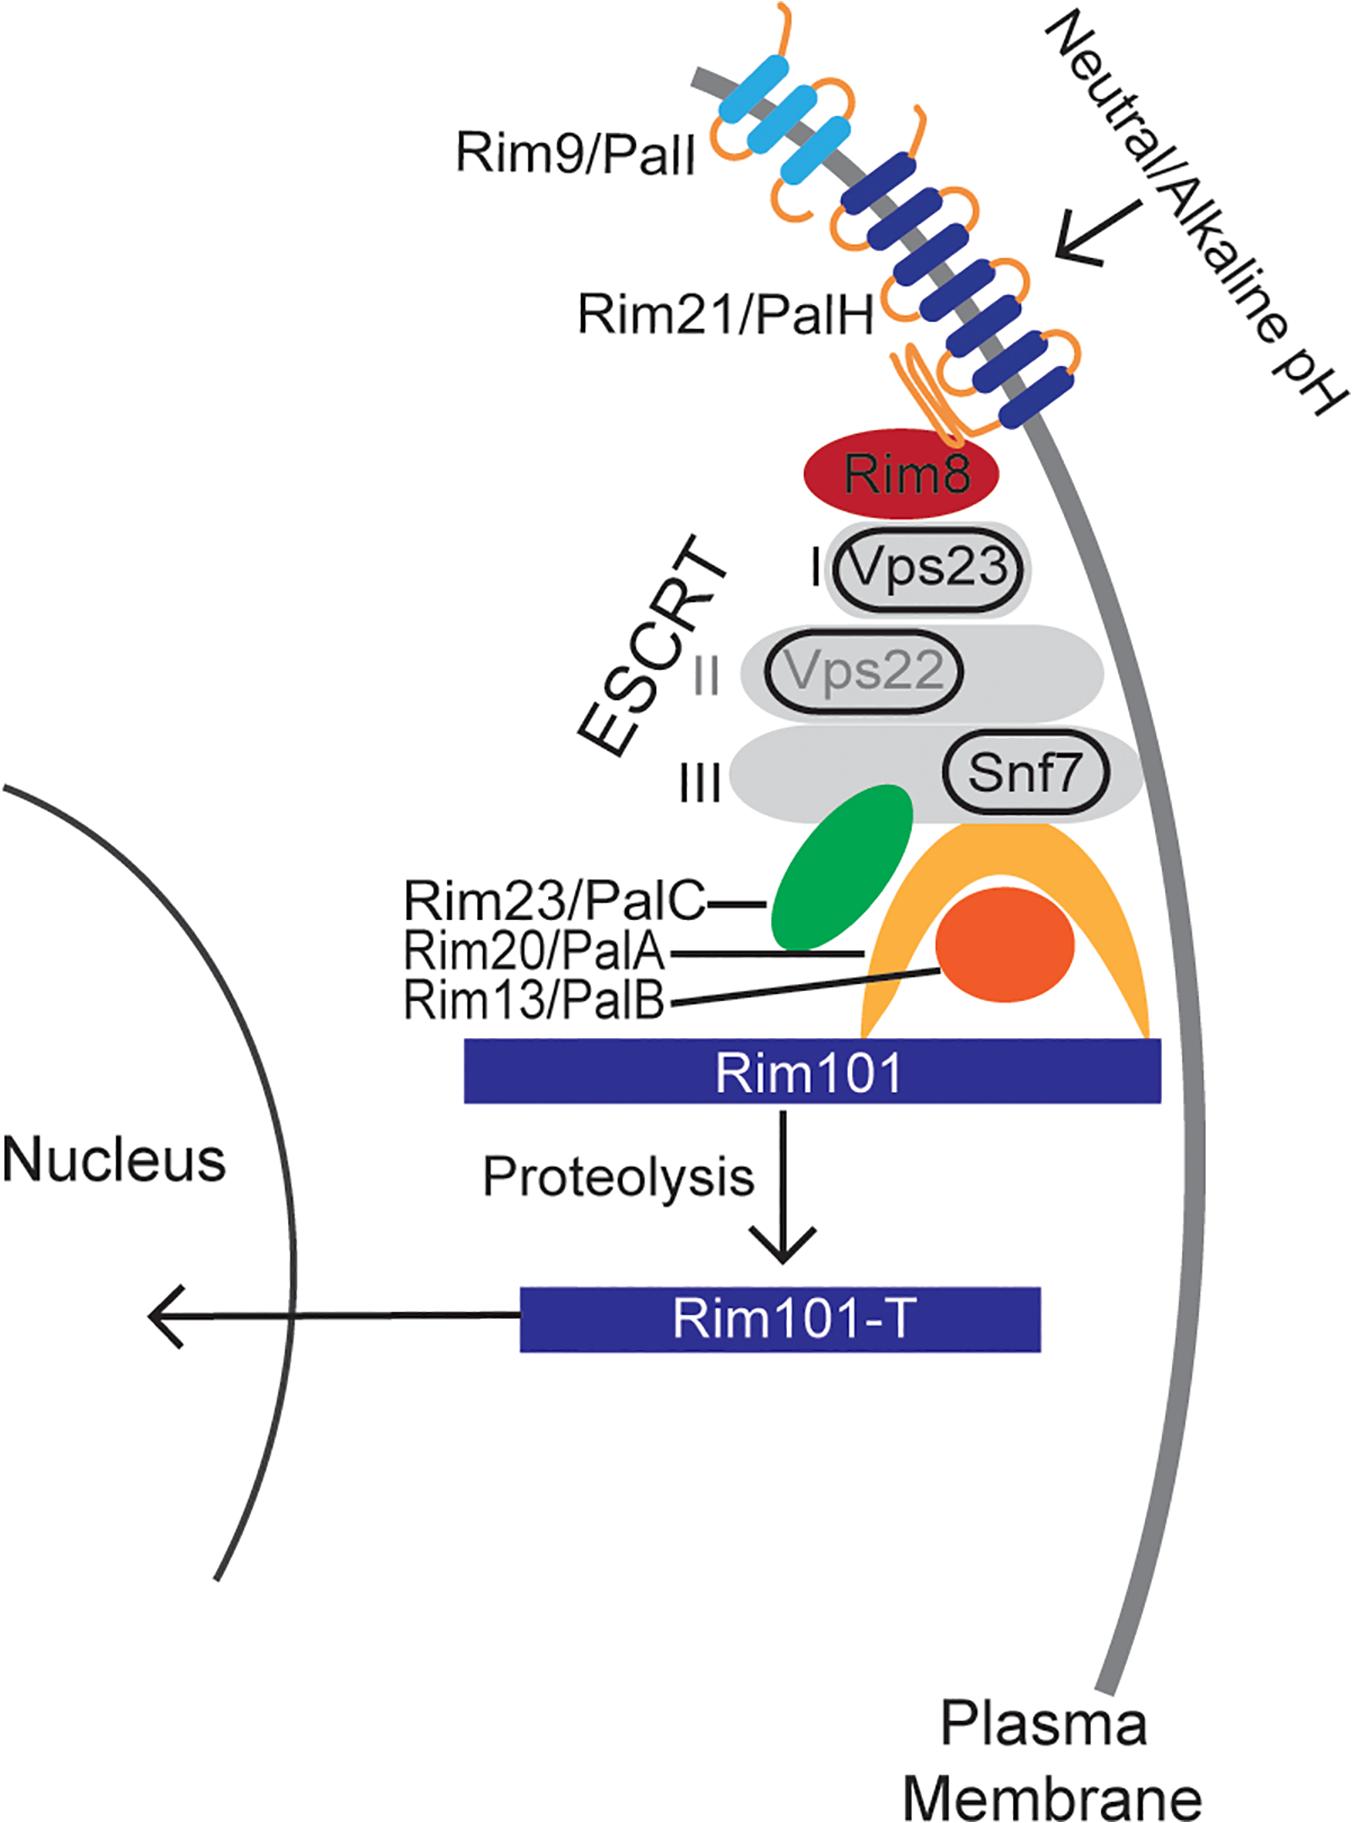 "A model of the canonical Rim pathway elucidated in ascomycete fungi [<em class=""ref"">21</em>,<em class=""ref"">24</em>]."